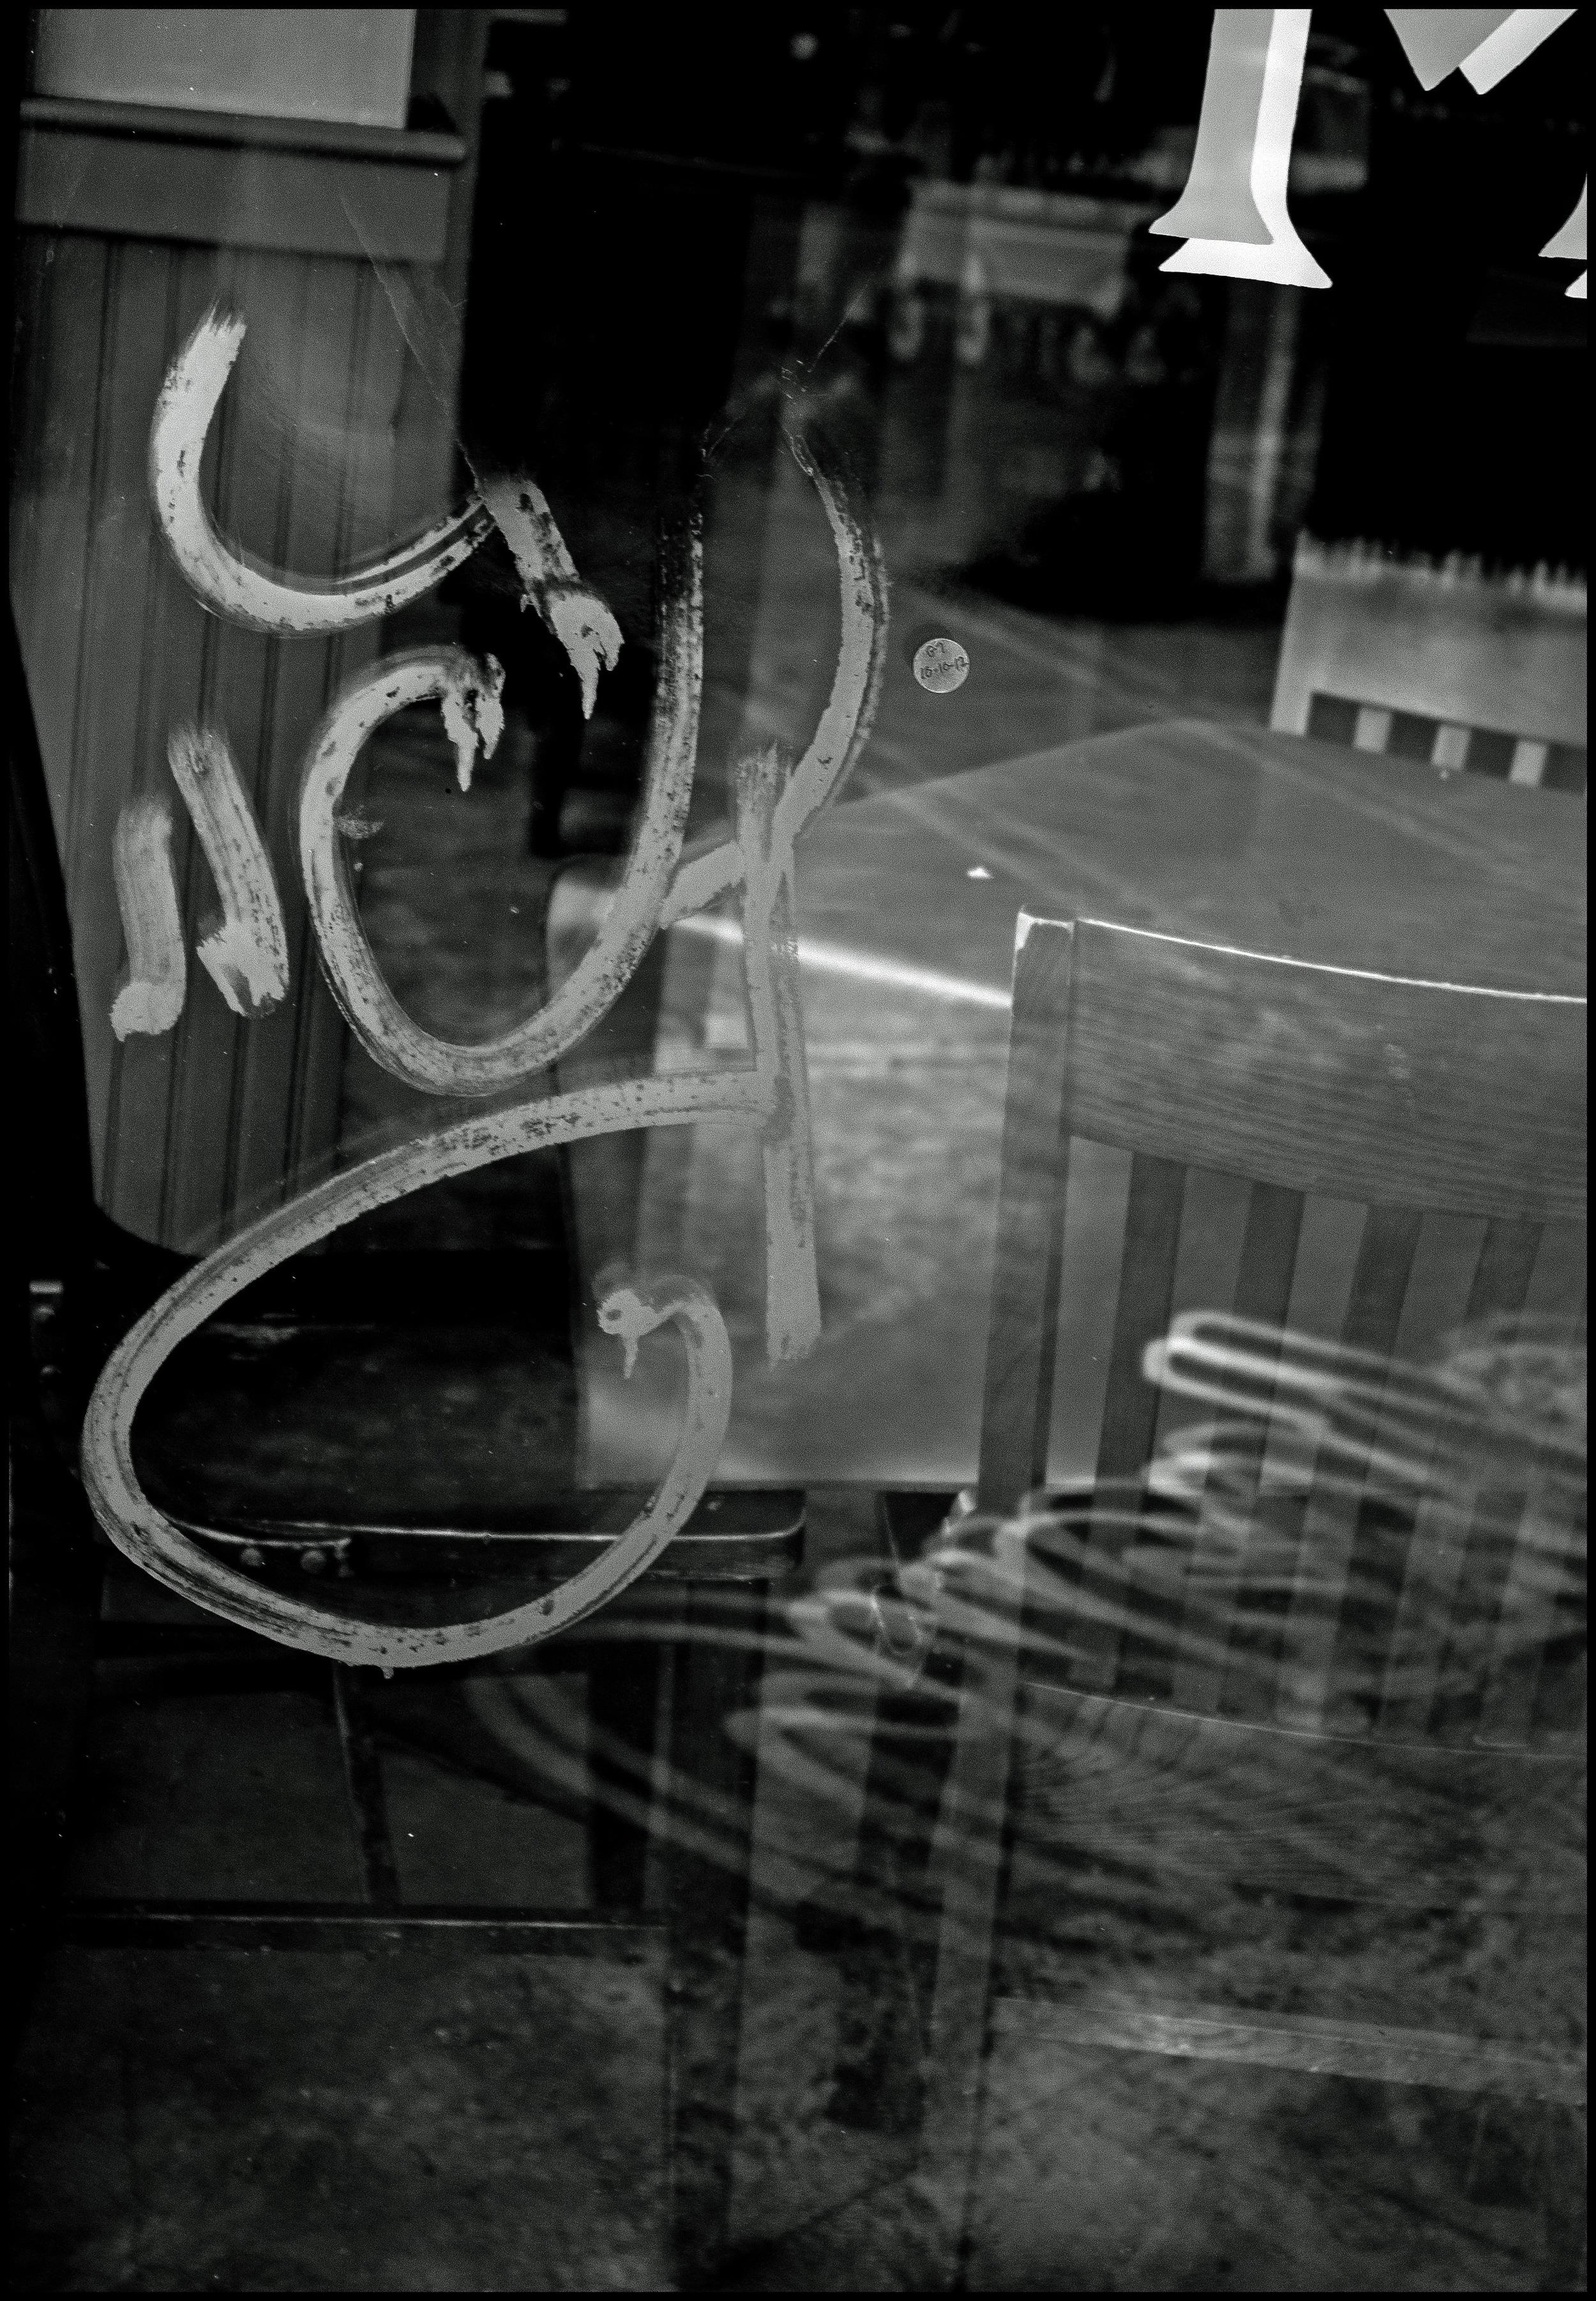 Window Graffiti & Restaurant_1.jpg